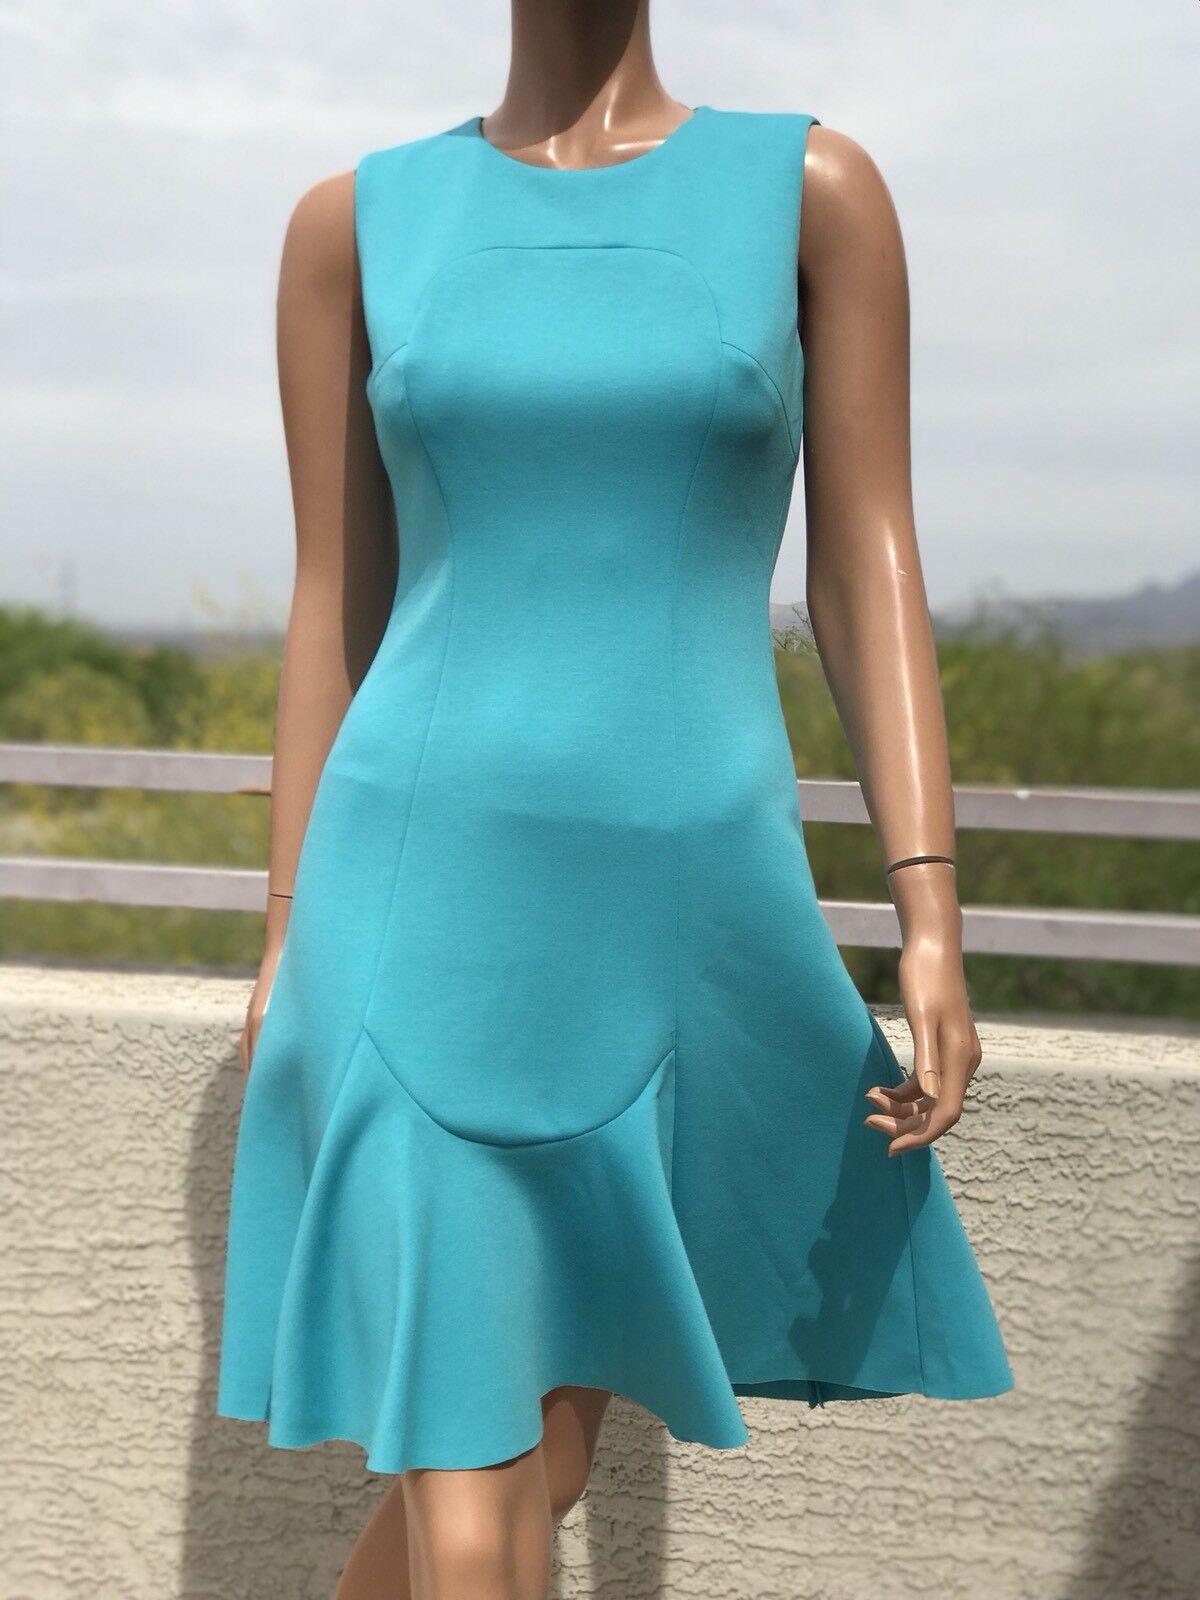 Elie Tahari Lizzie Fit and Flare Dress US2&4